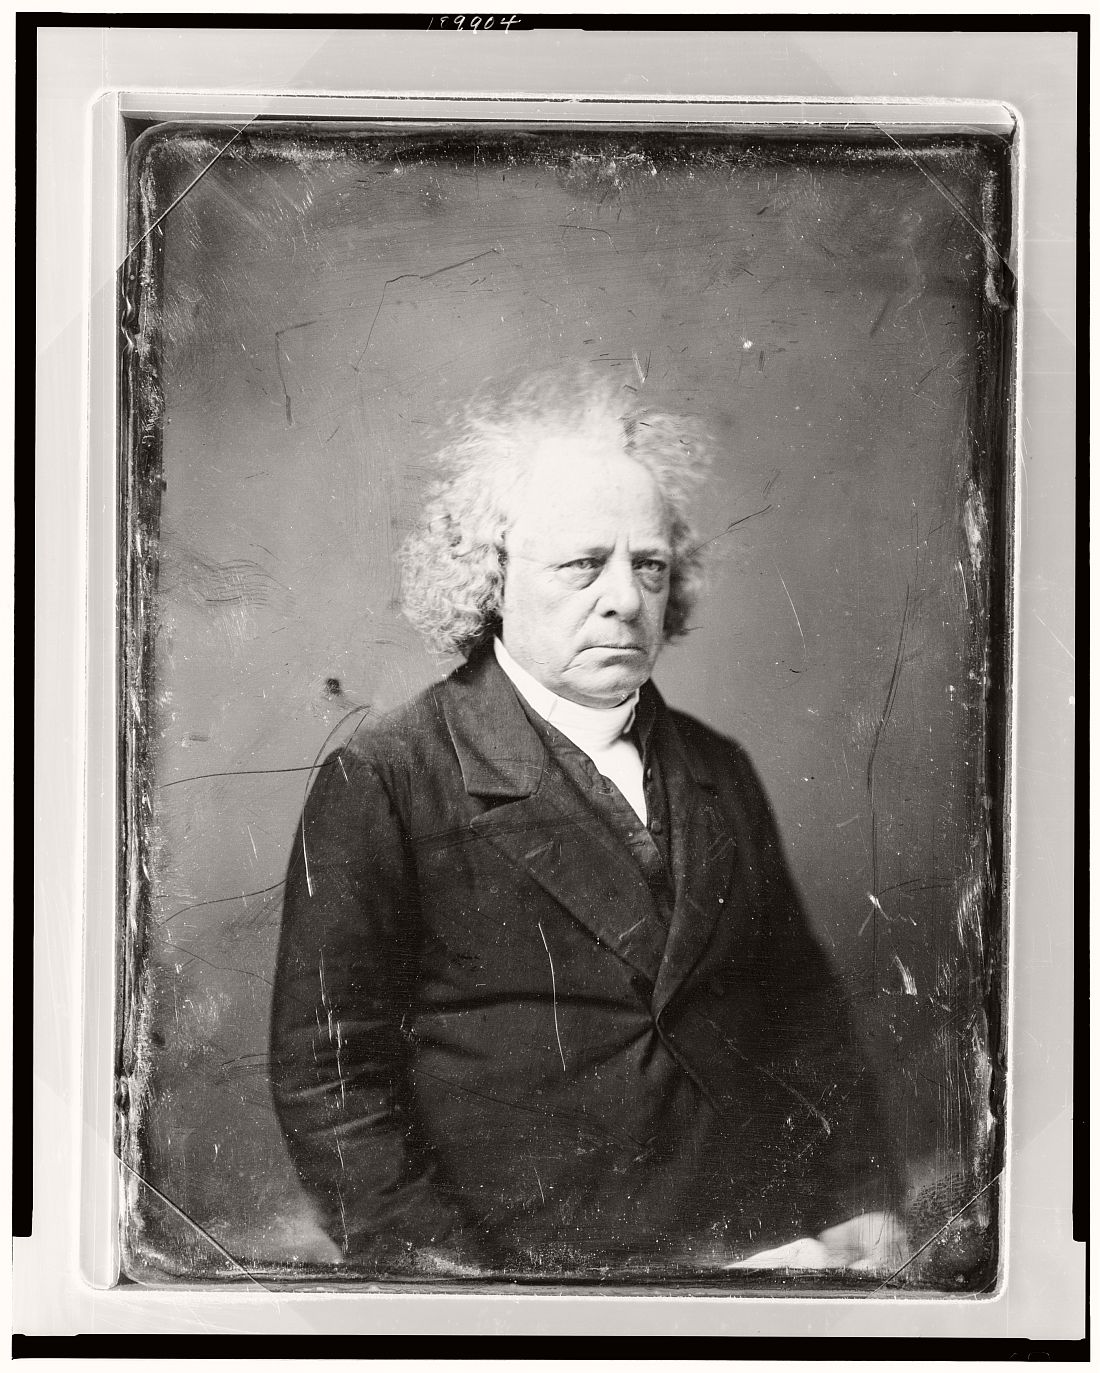 vintage-daguerreotype-portraits-from-xix-century-1844-1860-17